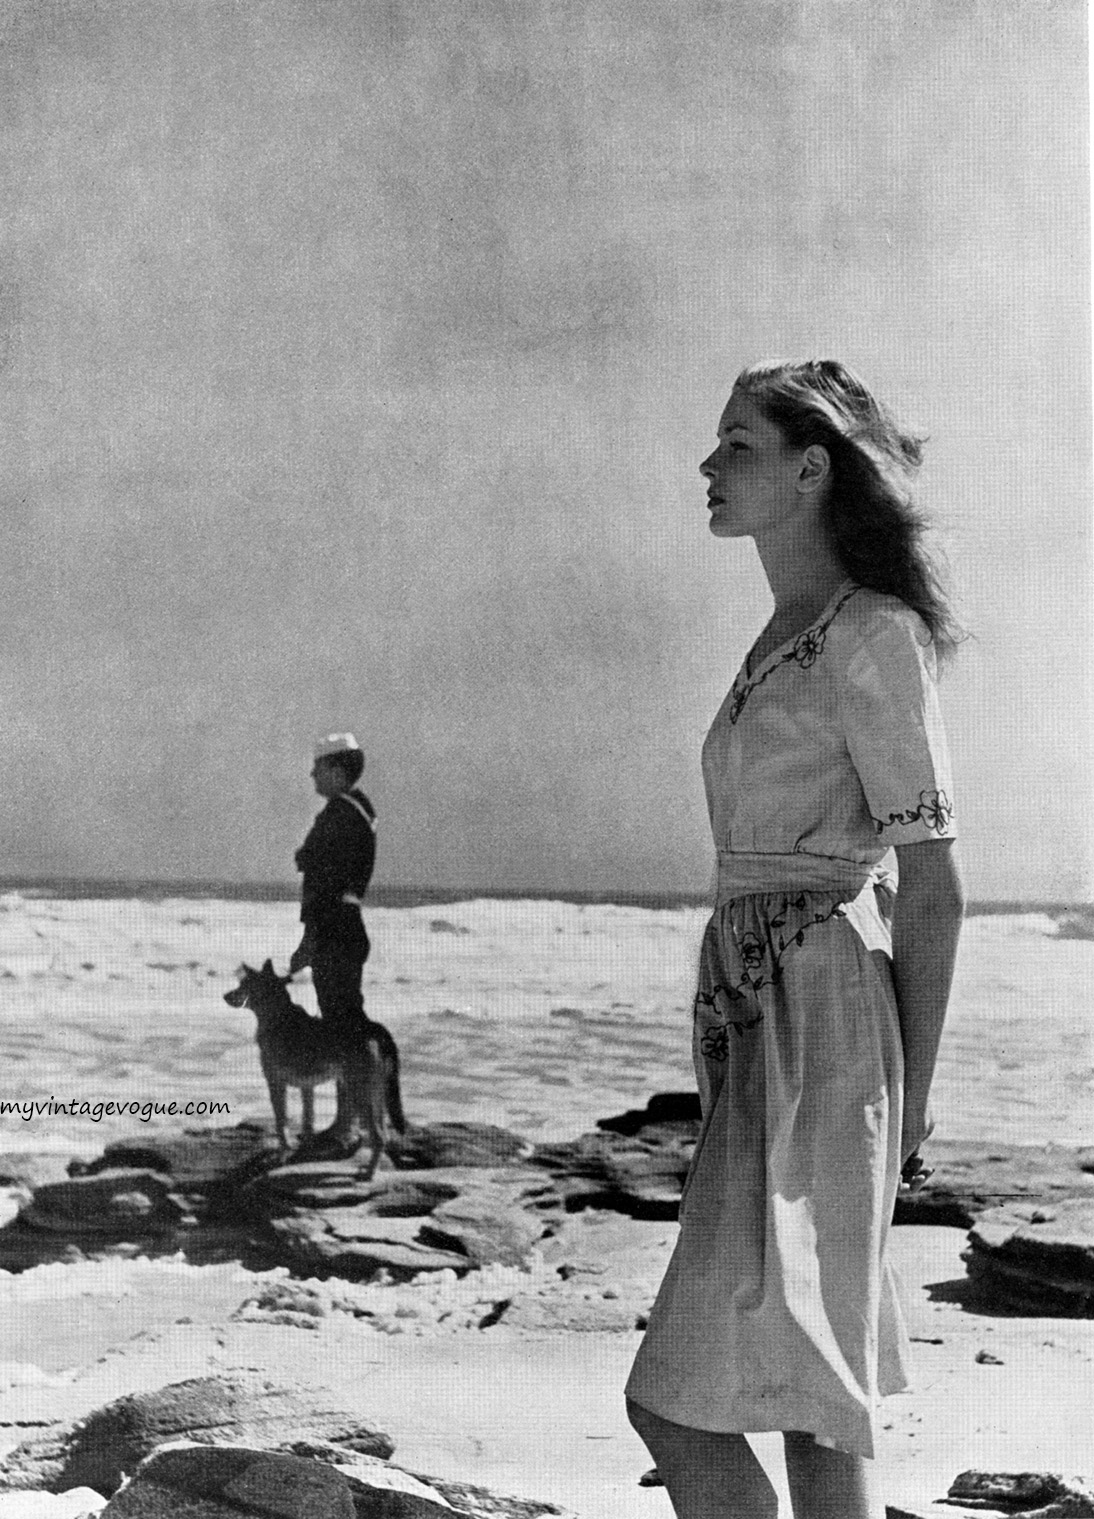 Lauren Bacall, Harper's Bazaar, May 1943. Photo by Louise Dahl-Wolfe.